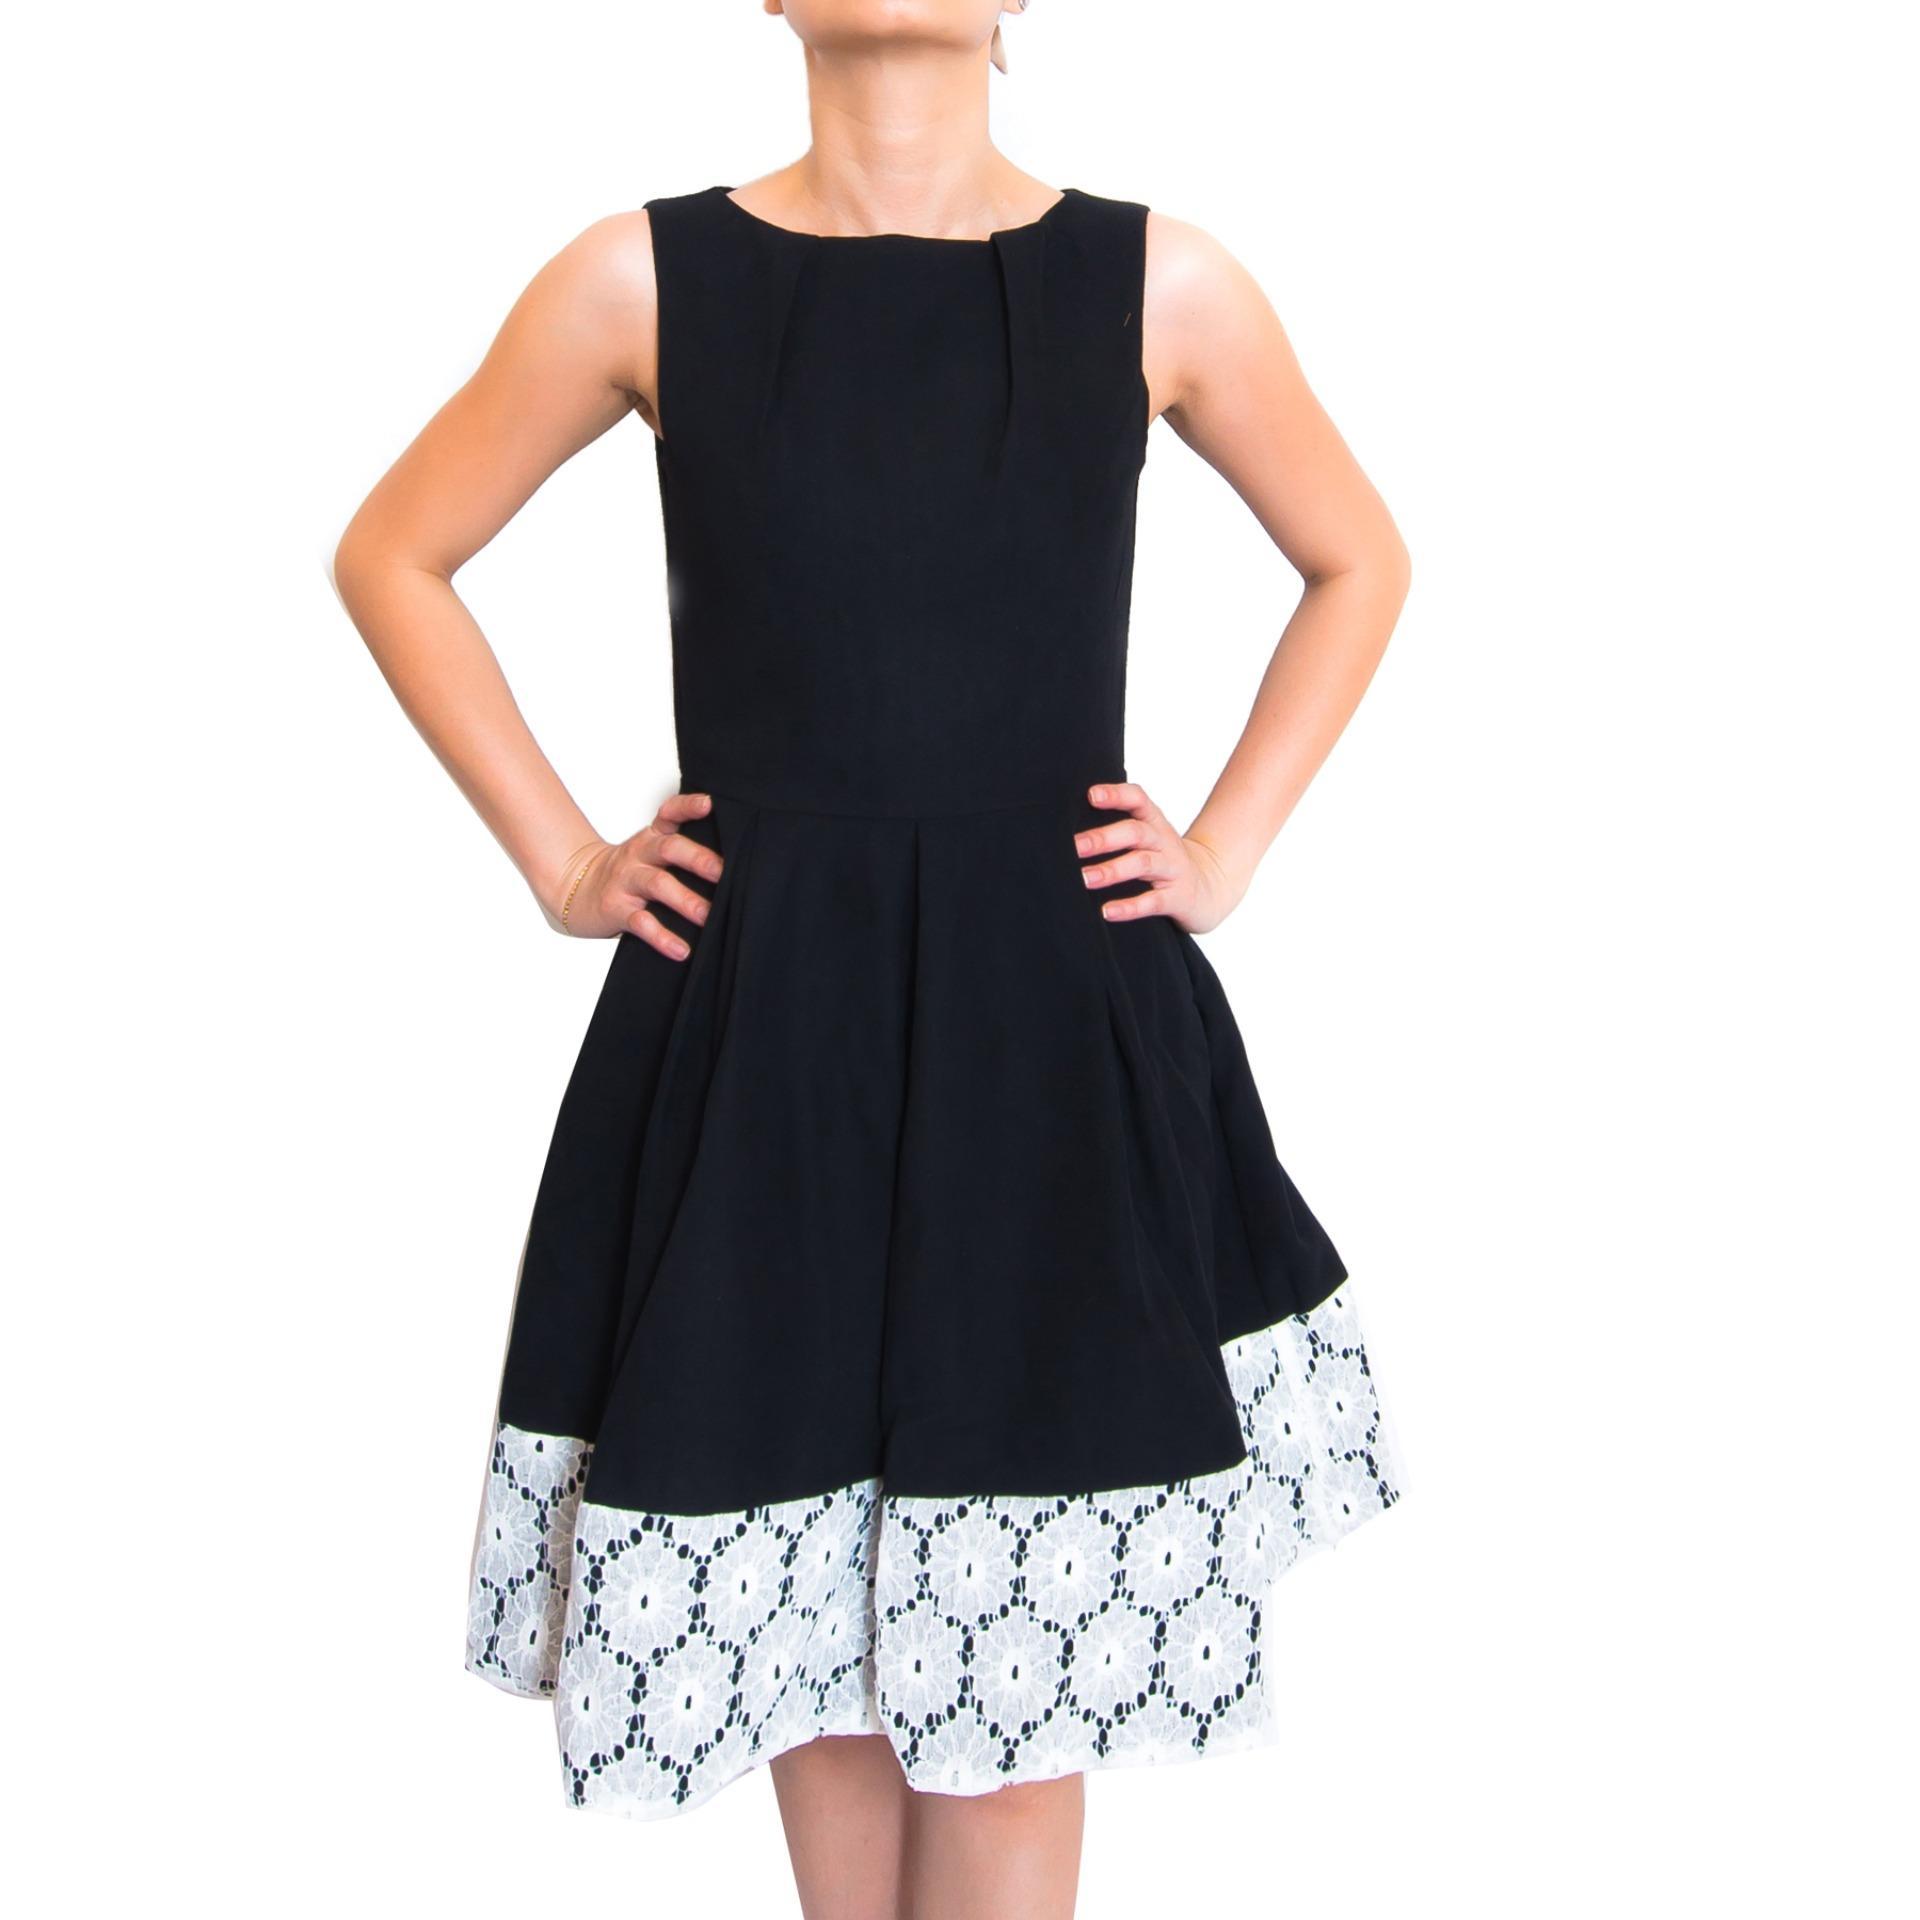 Kory & Lanza Multi-Layer Lace Swing Dress  in Black